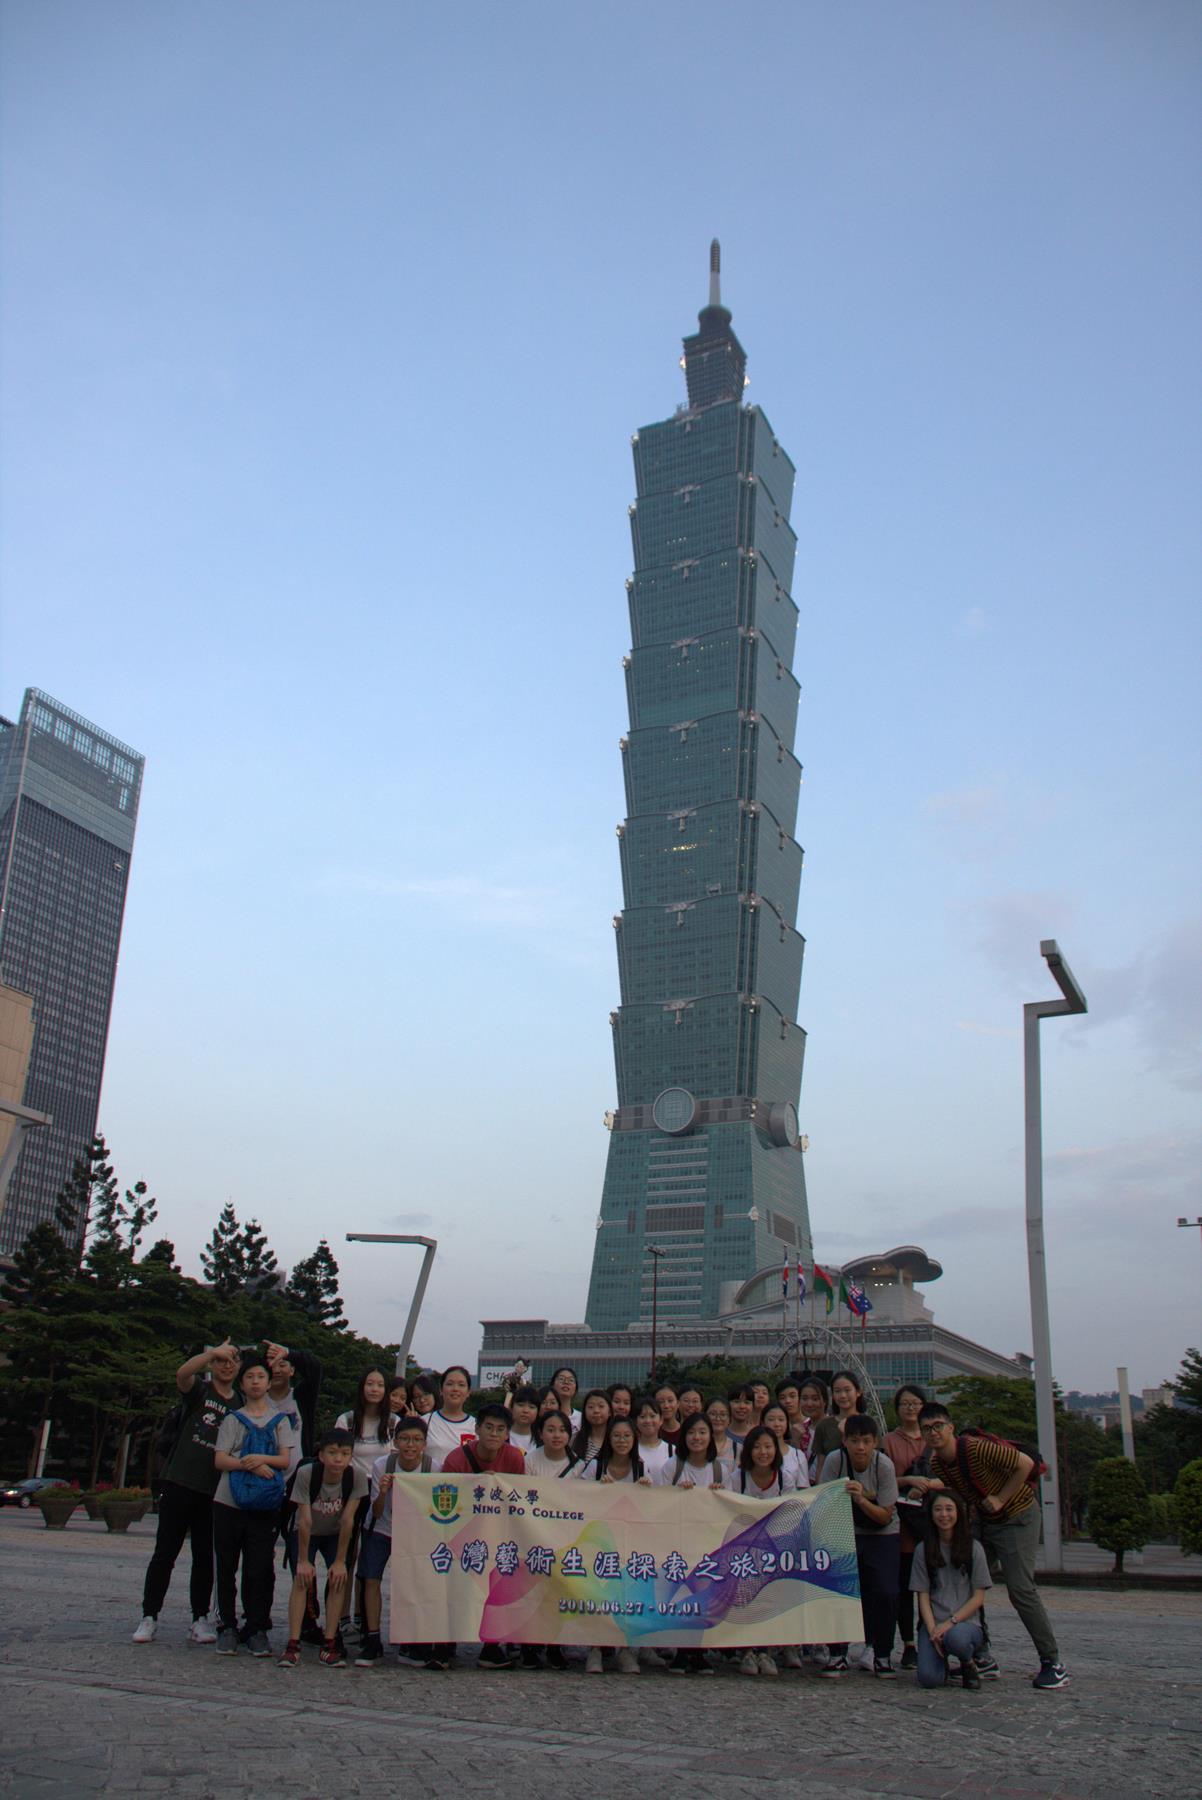 http://npc.edu.hk/sites/default/files/img_1812_1.jpg